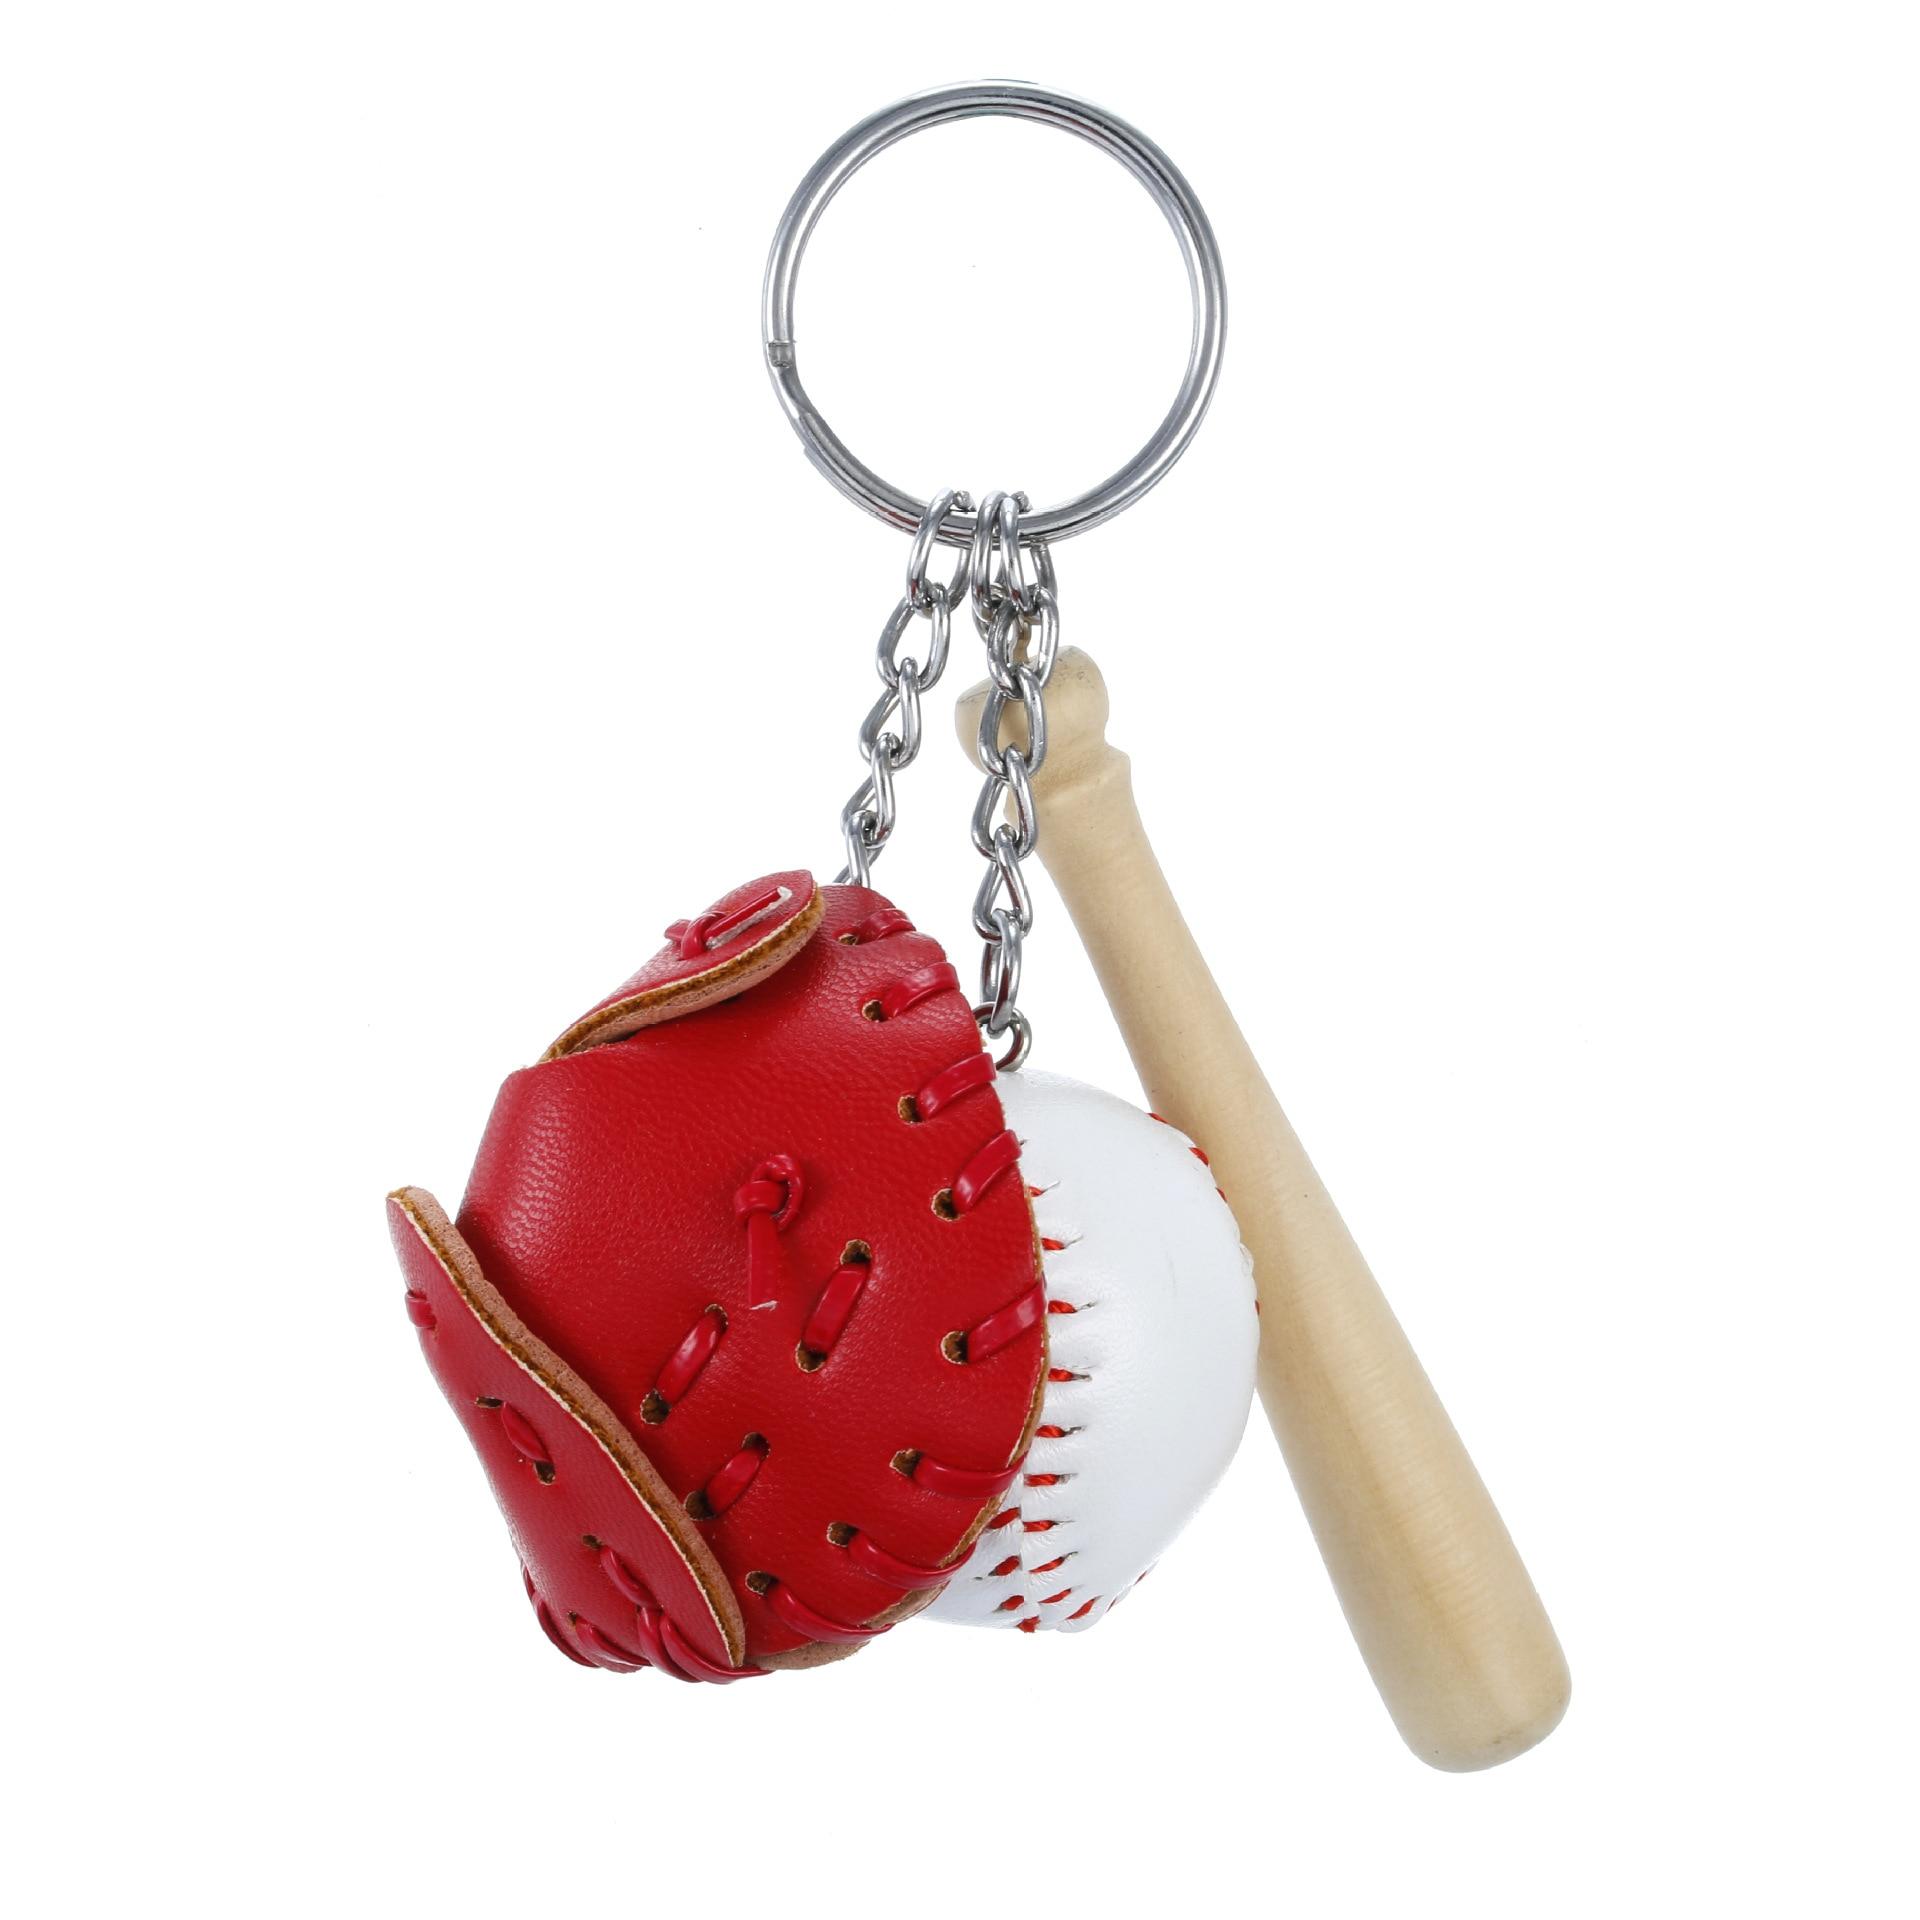 Creative Baseball Keychain Bag Pendant Baseball Fan Supplies Gifts Sports Souvenirs Fun Holiday Jewe